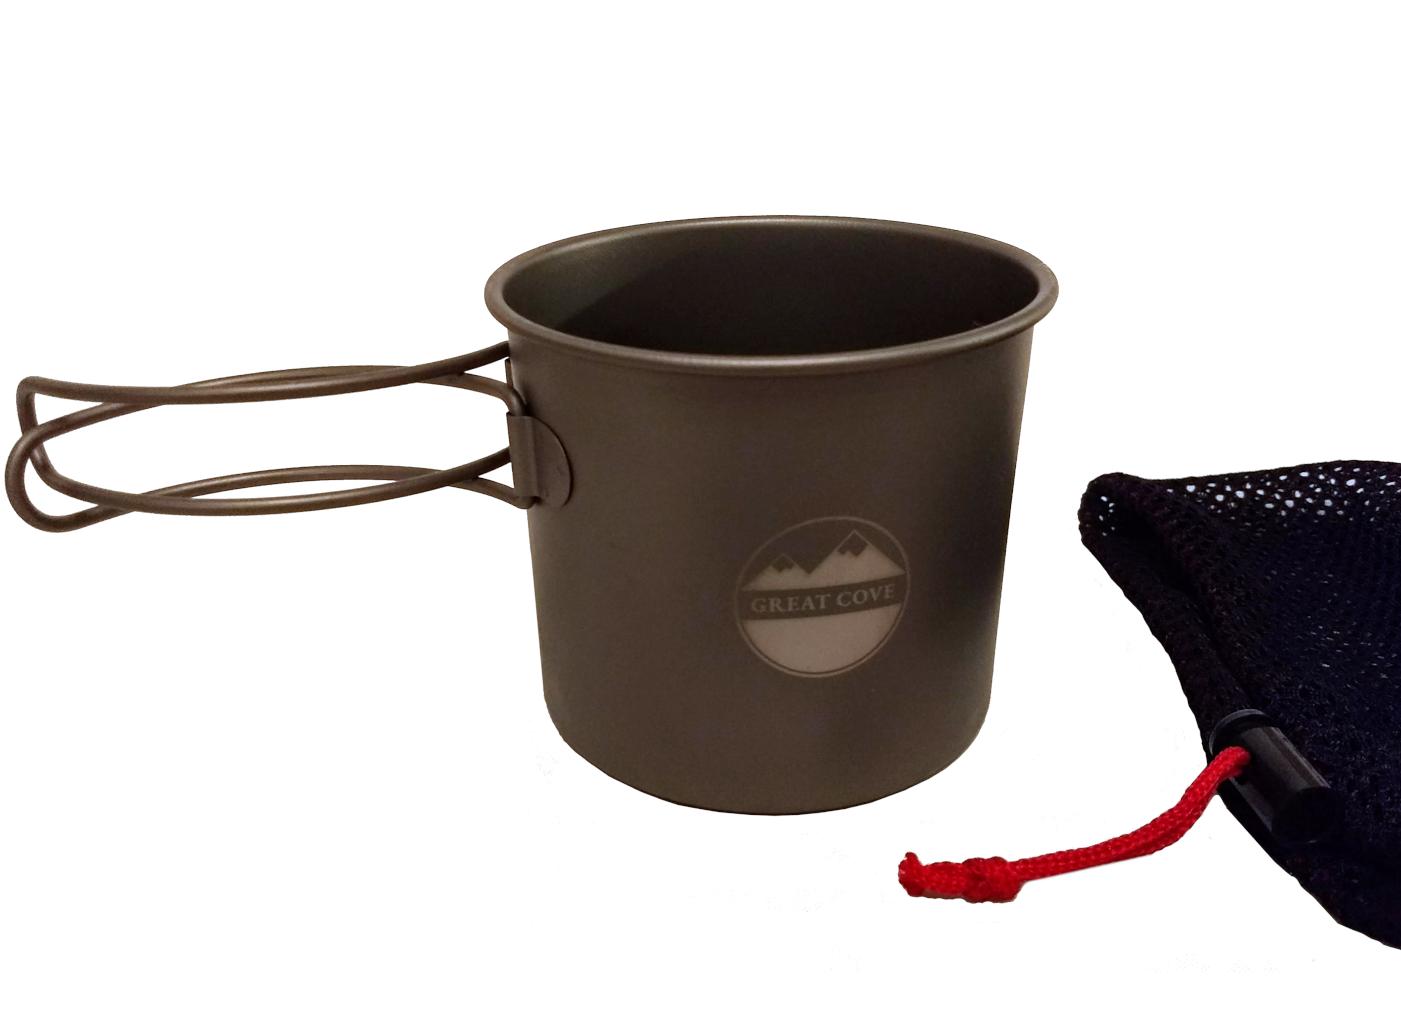 Great Cove Lightweight Titanium Backpacking/Camping 500ml Pot/Mug with mesh bag